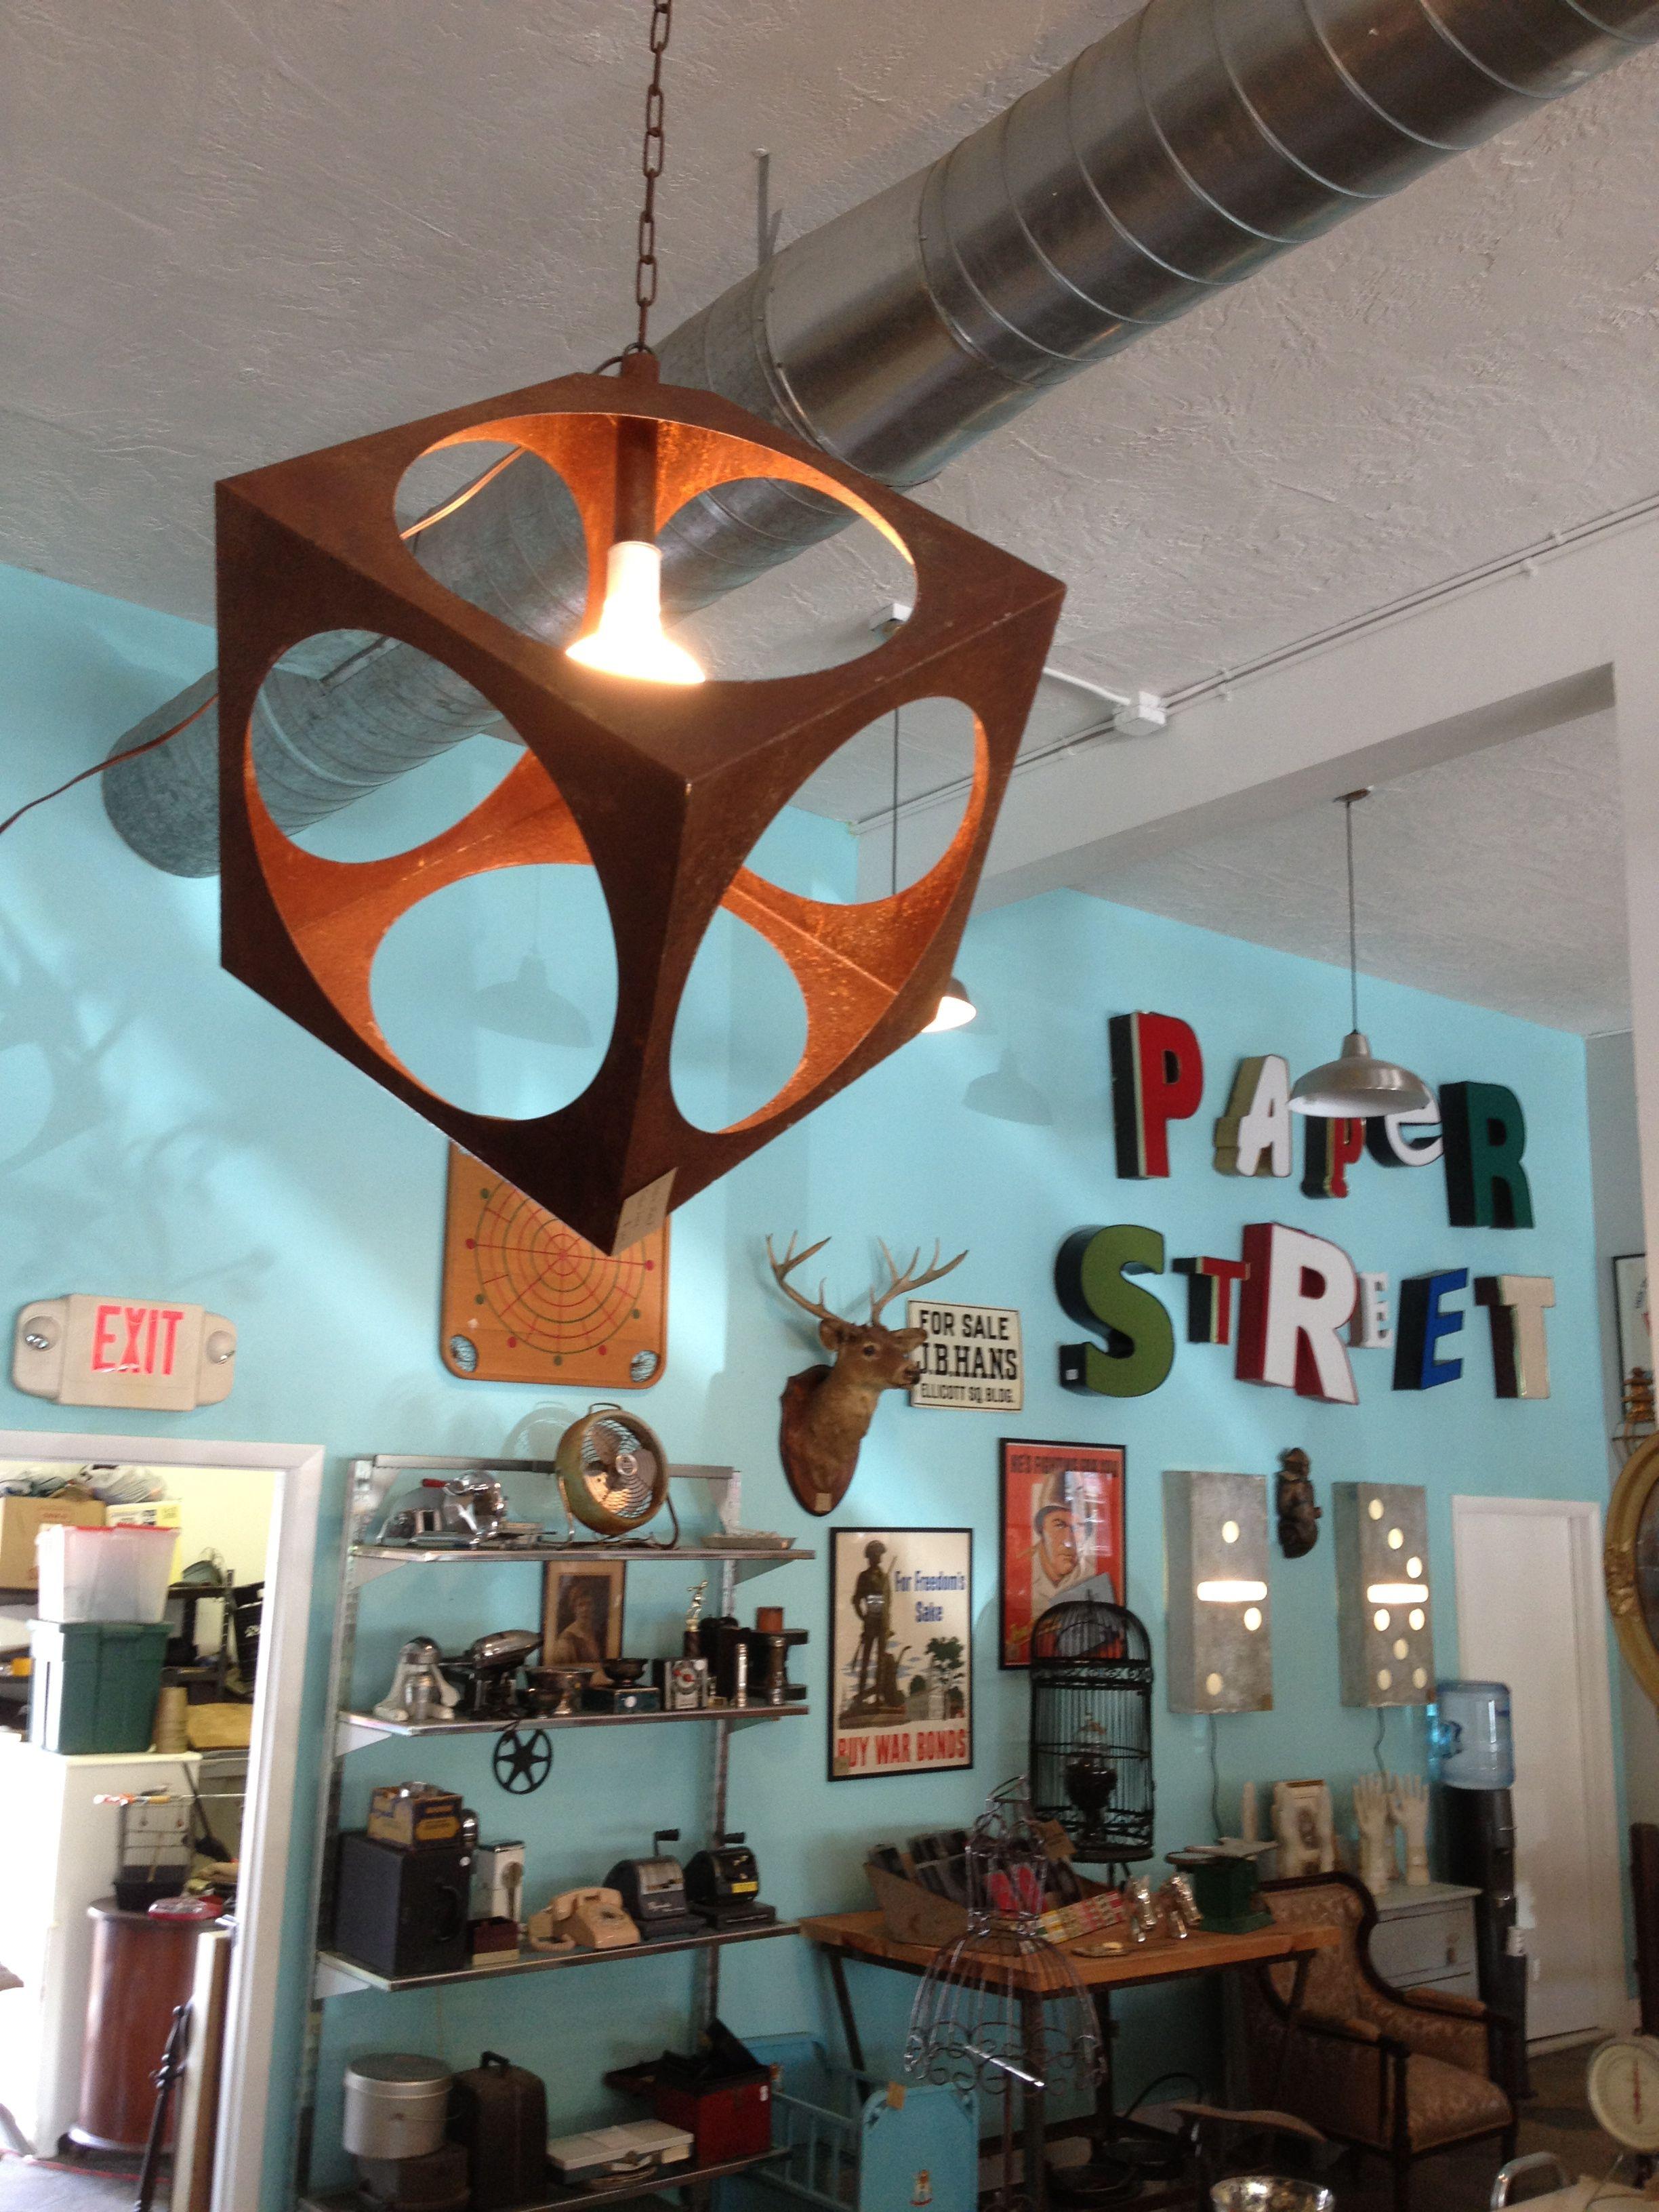 Paper Street Market, antique shop in downtown St. Pete